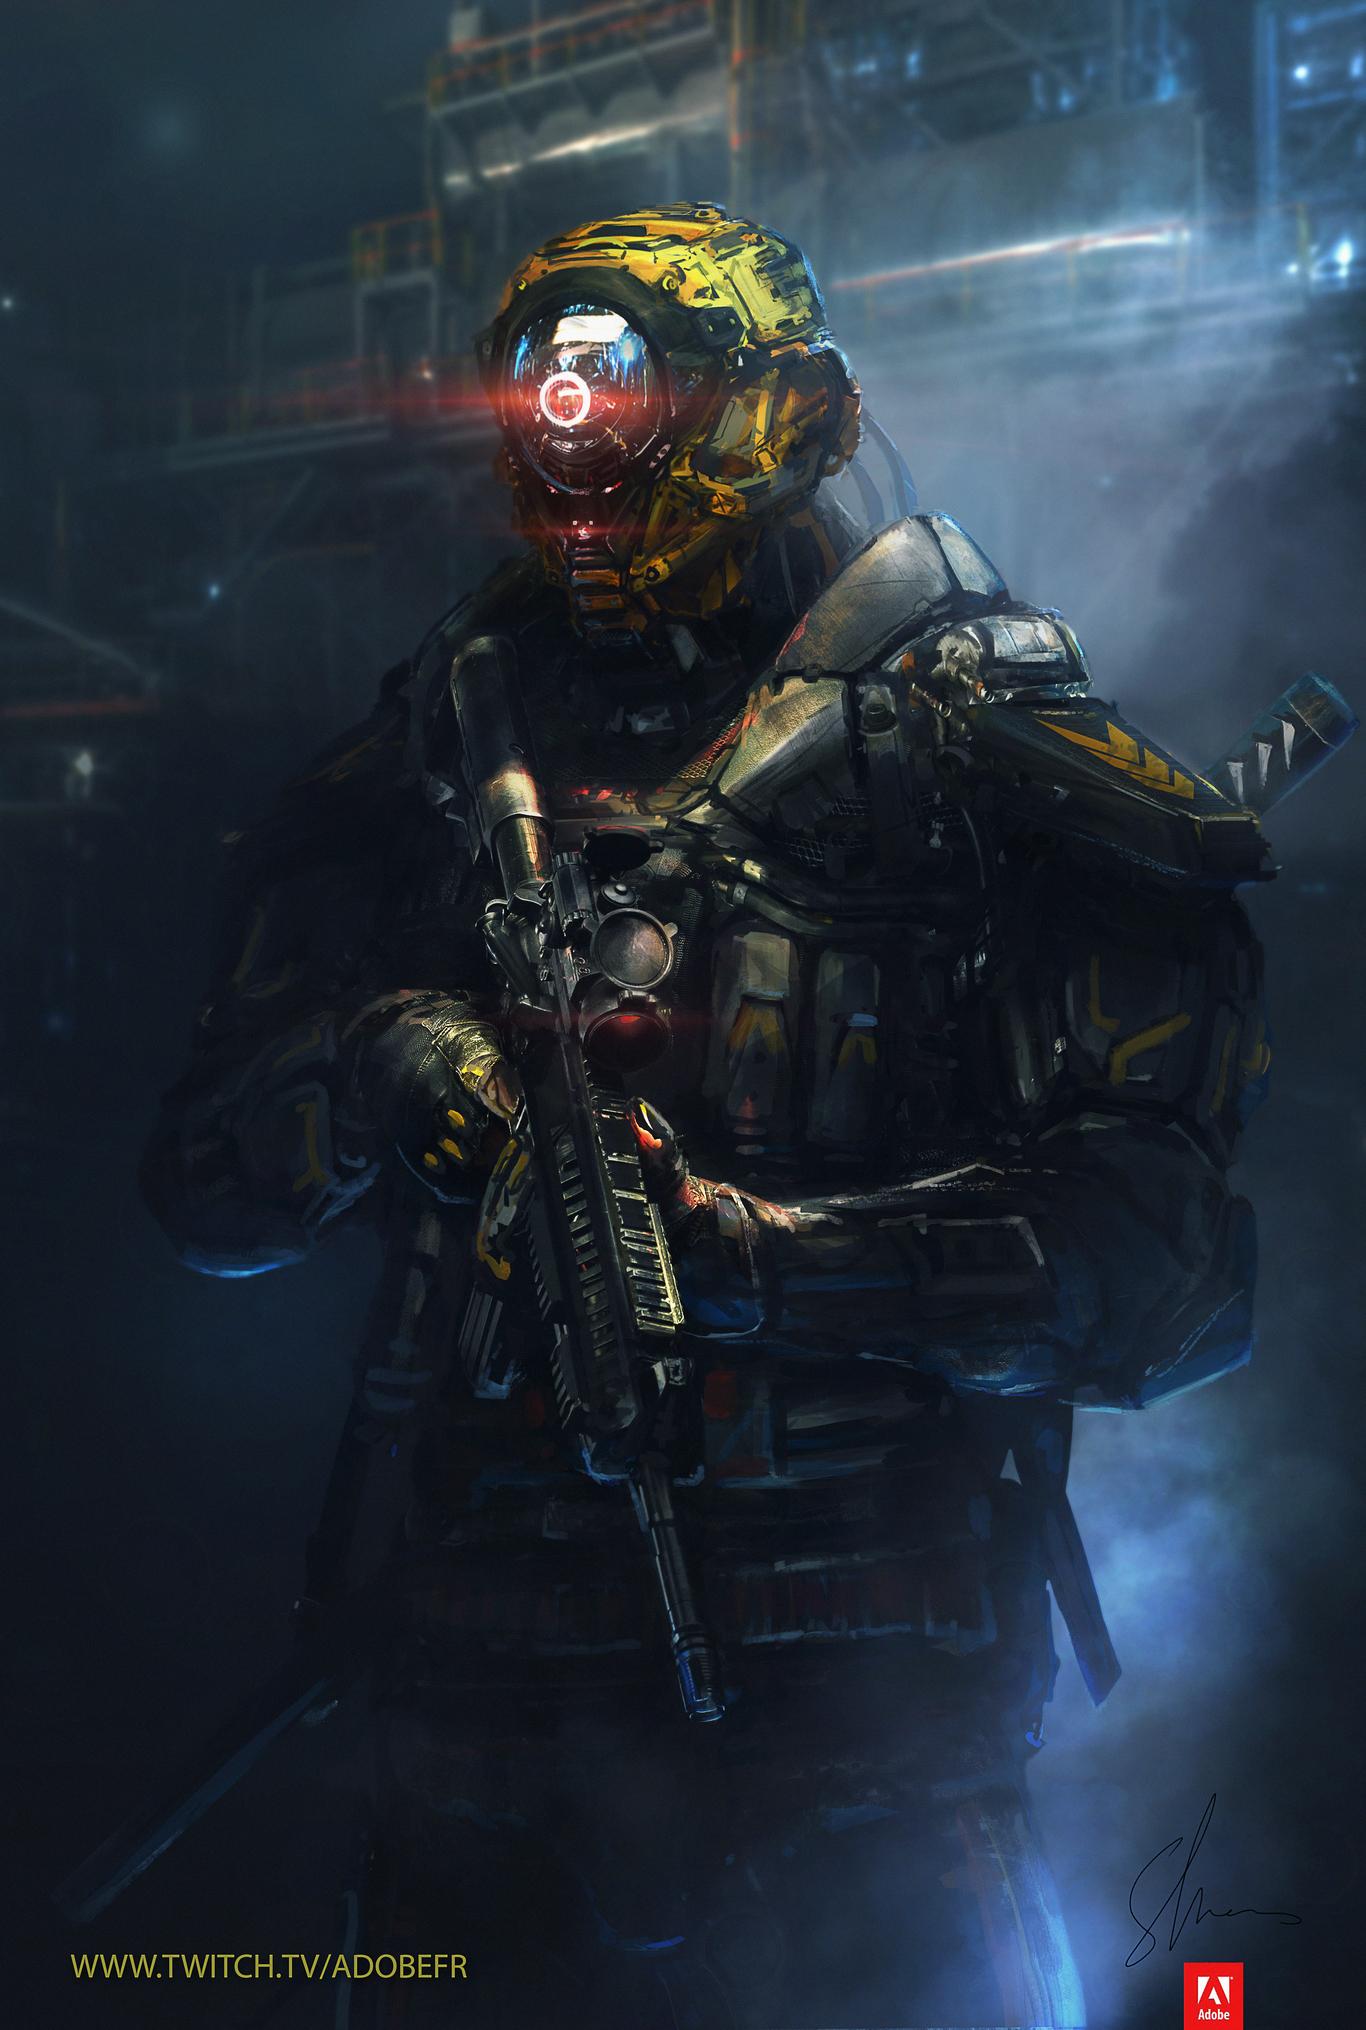 Shue13 the cyclops guardian 1 03eda8c4 ol3t